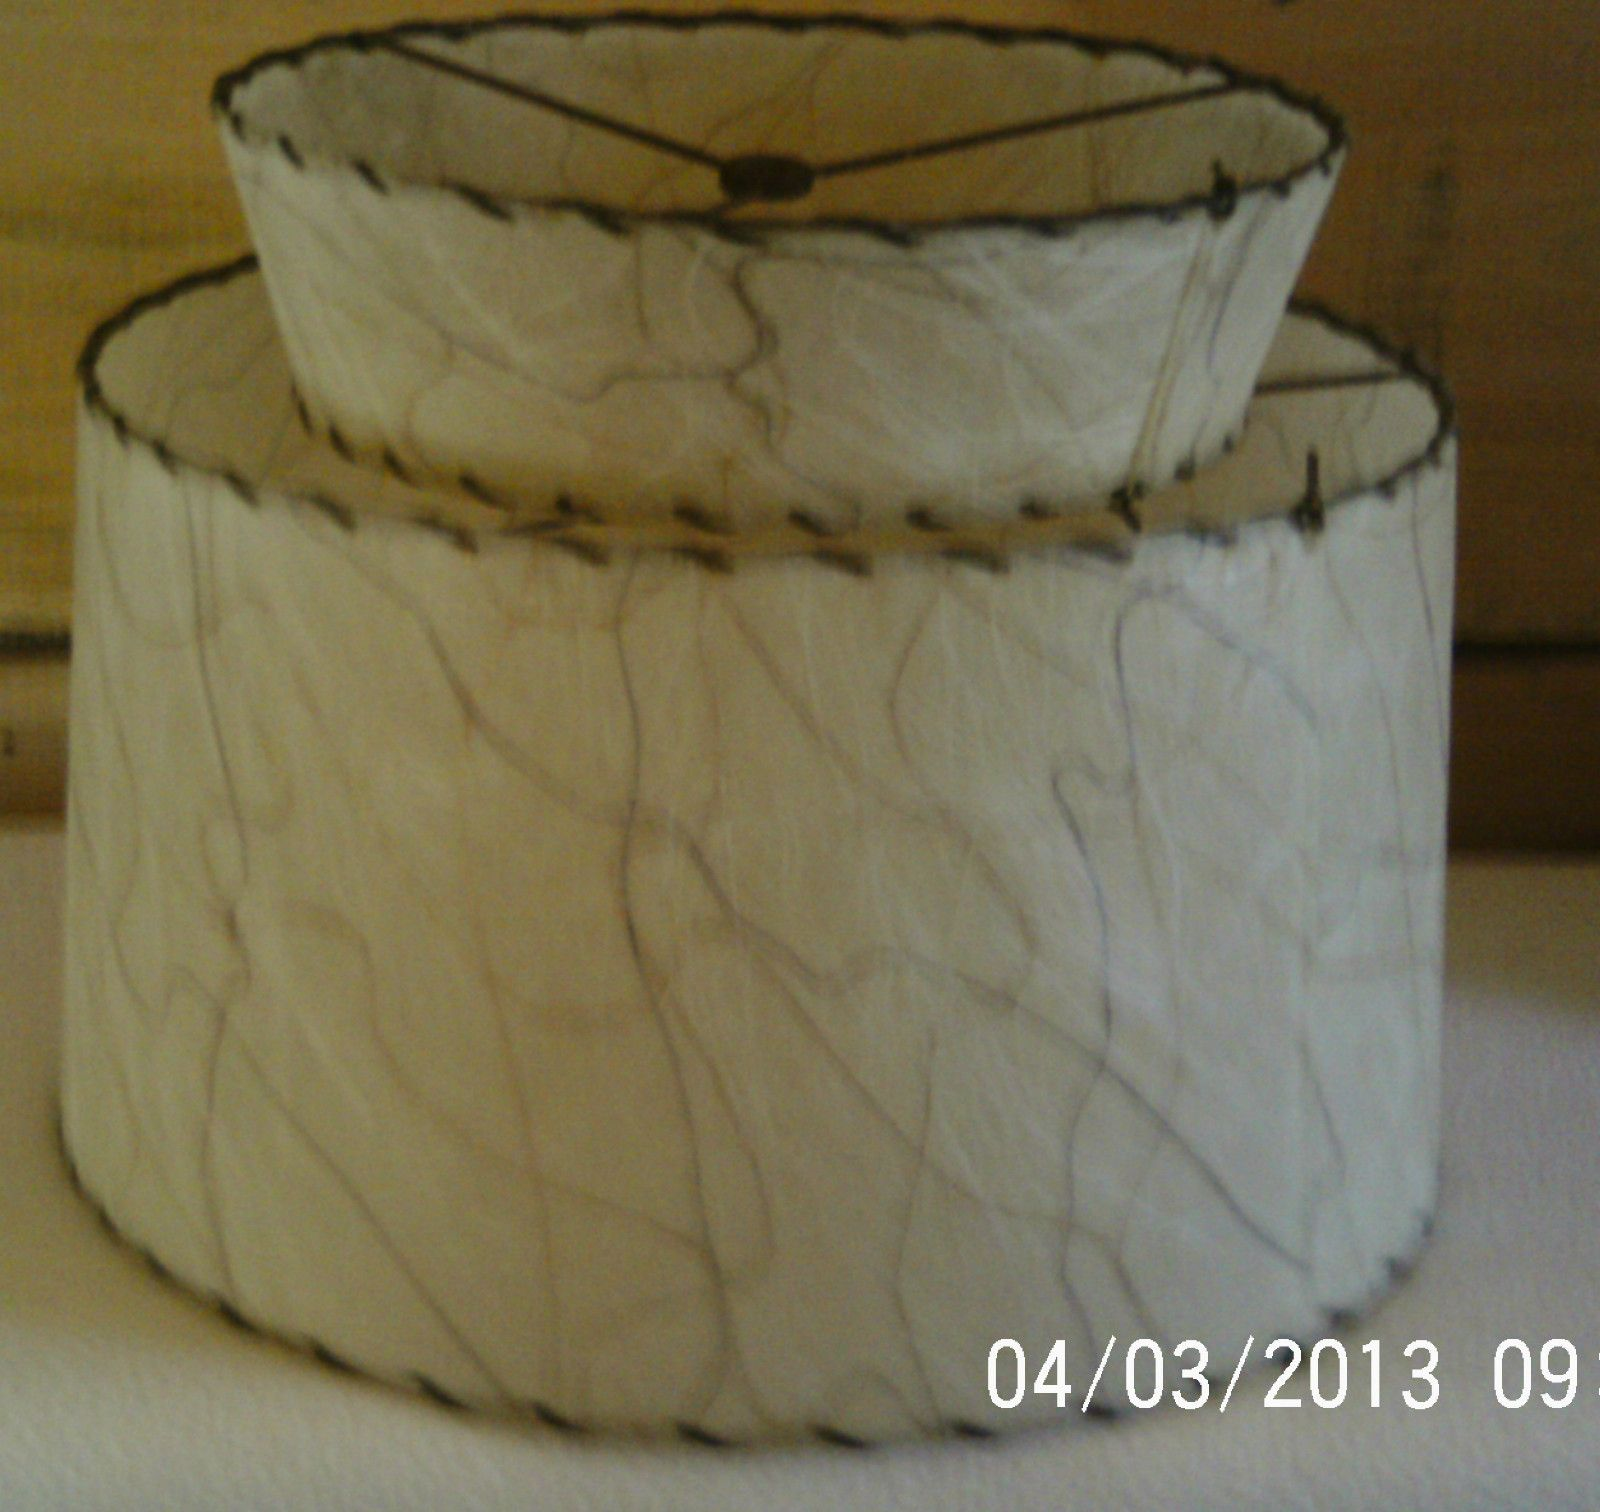 Retro mid century modern fiberglass tier lamp shade with lace trim retro mid century modern fiberglass tier lamp shade with lace trim large ebay aloadofball Gallery